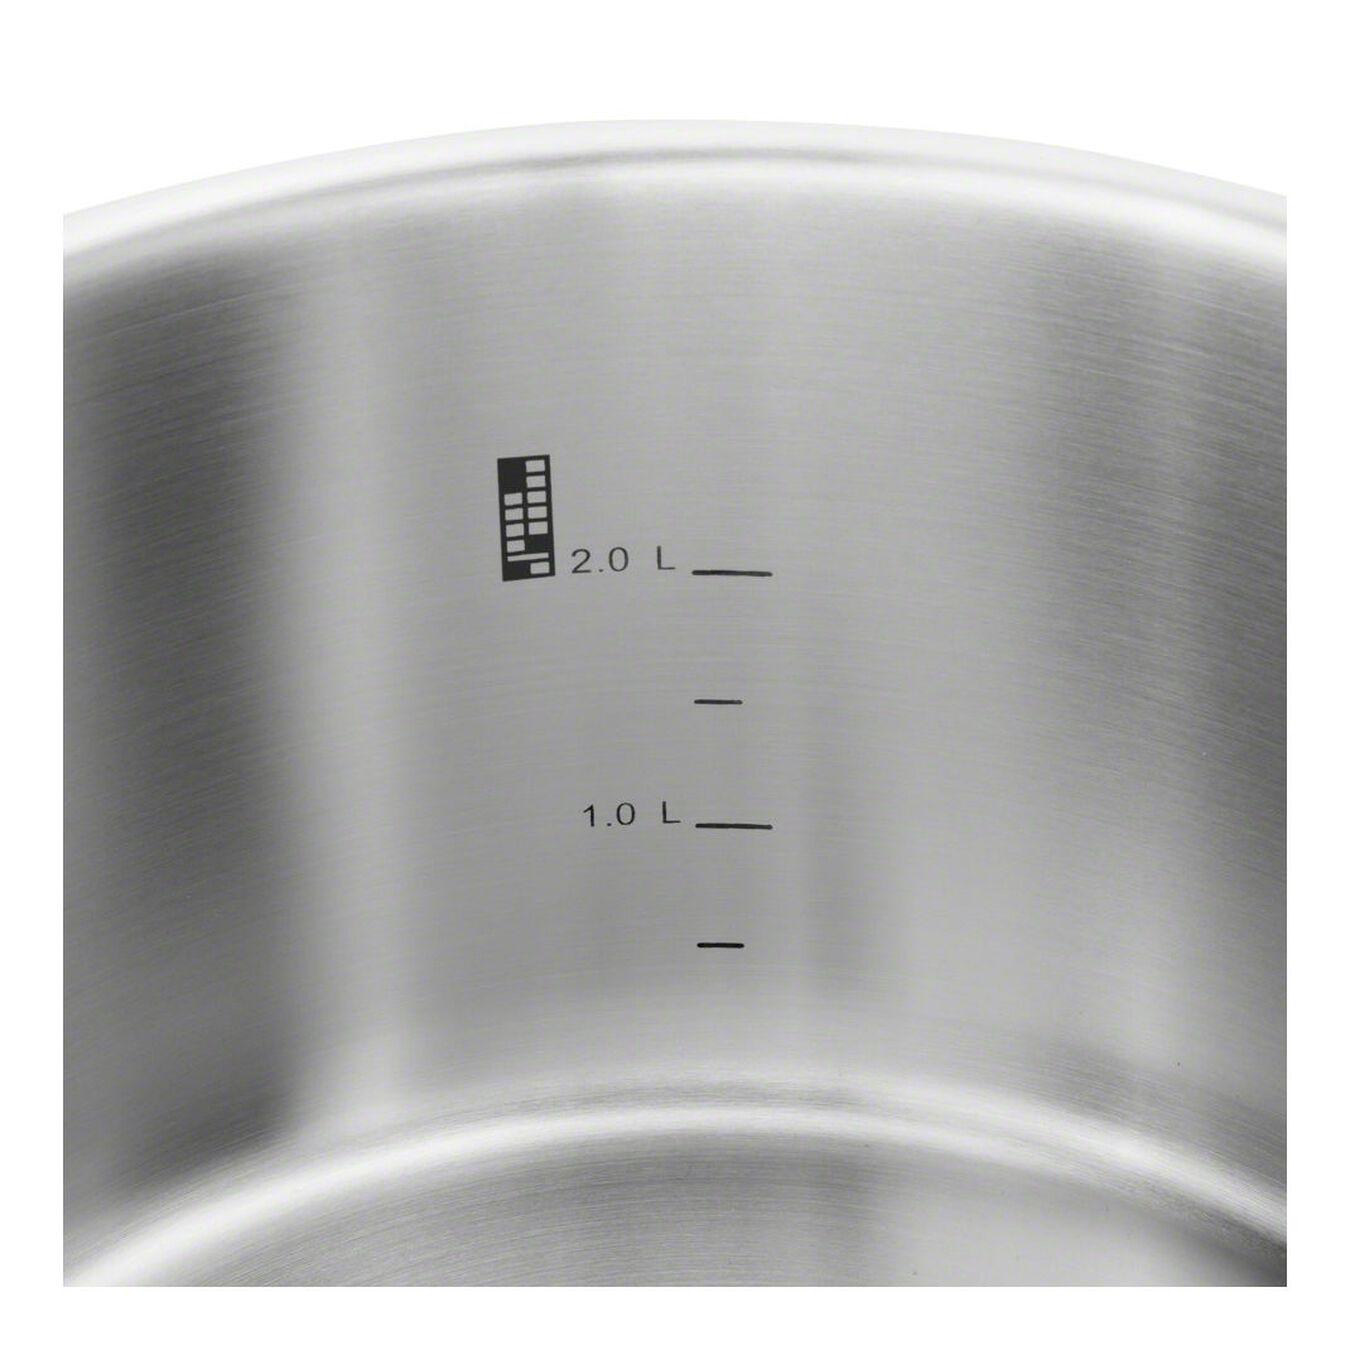 Tencere Seti | 18/10 Paslanmaz Çelik | 5-parça,,large 6